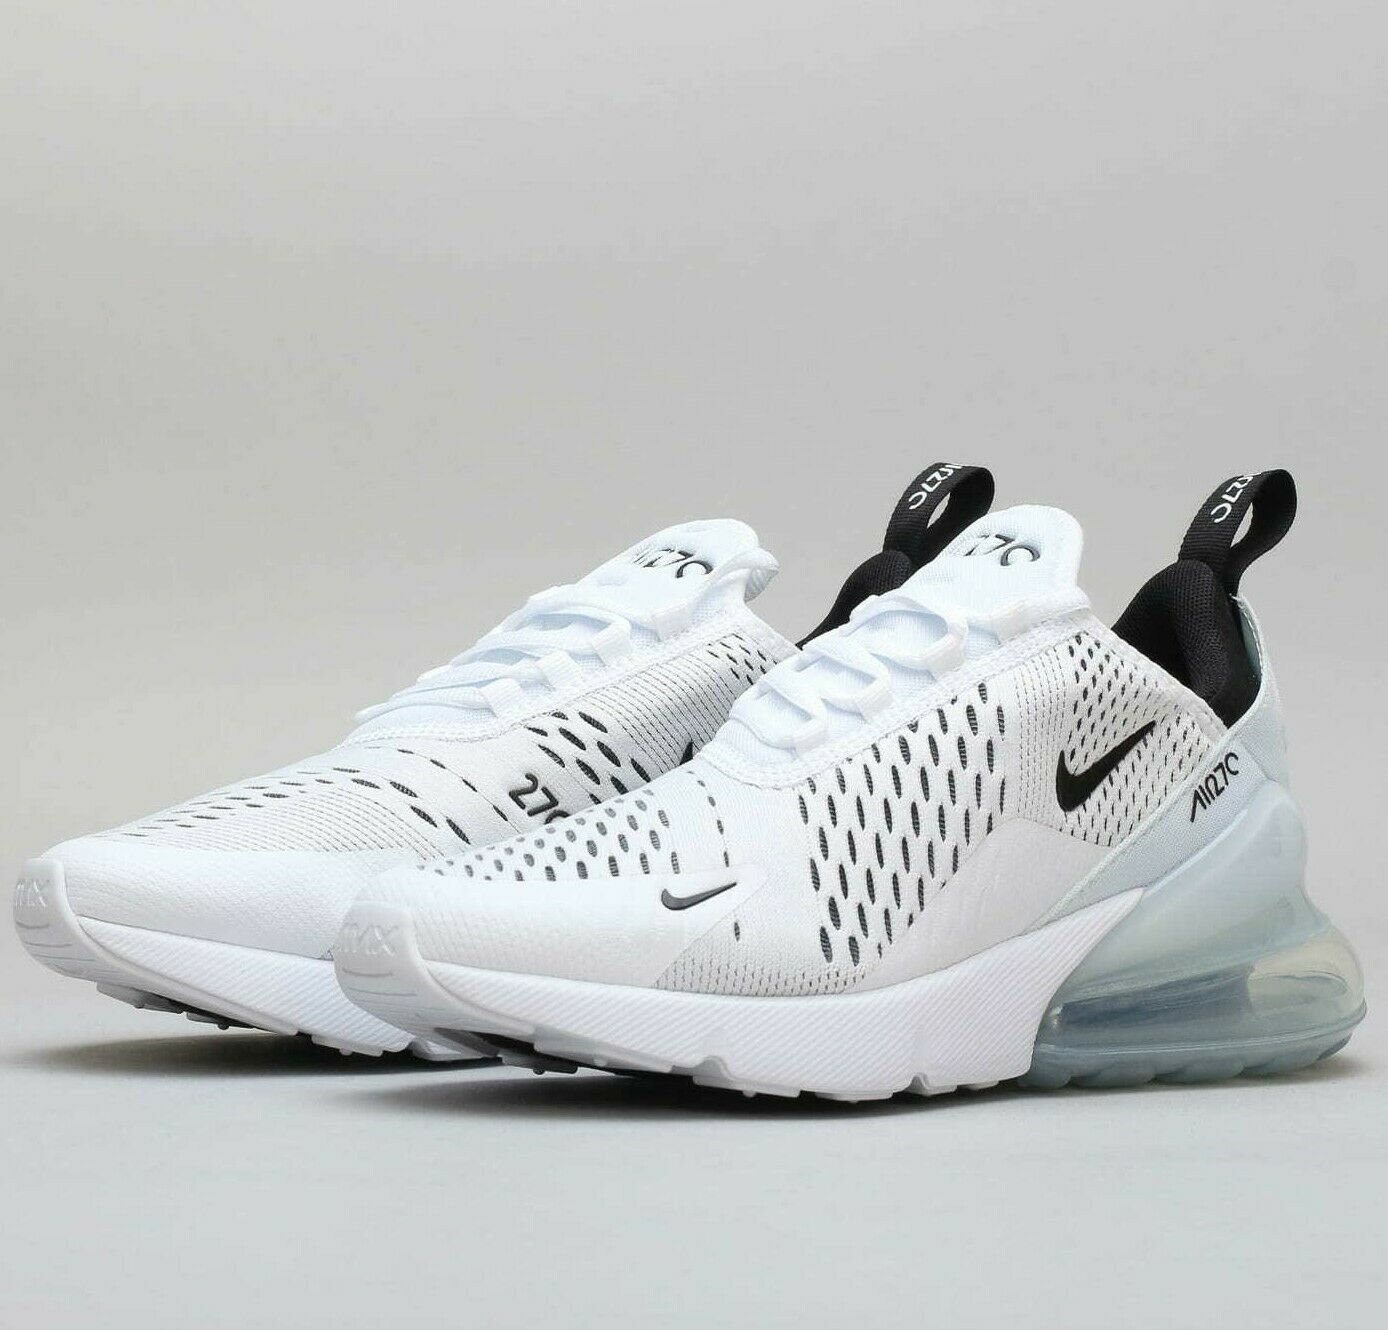 Nike Air Max 270 White Black W